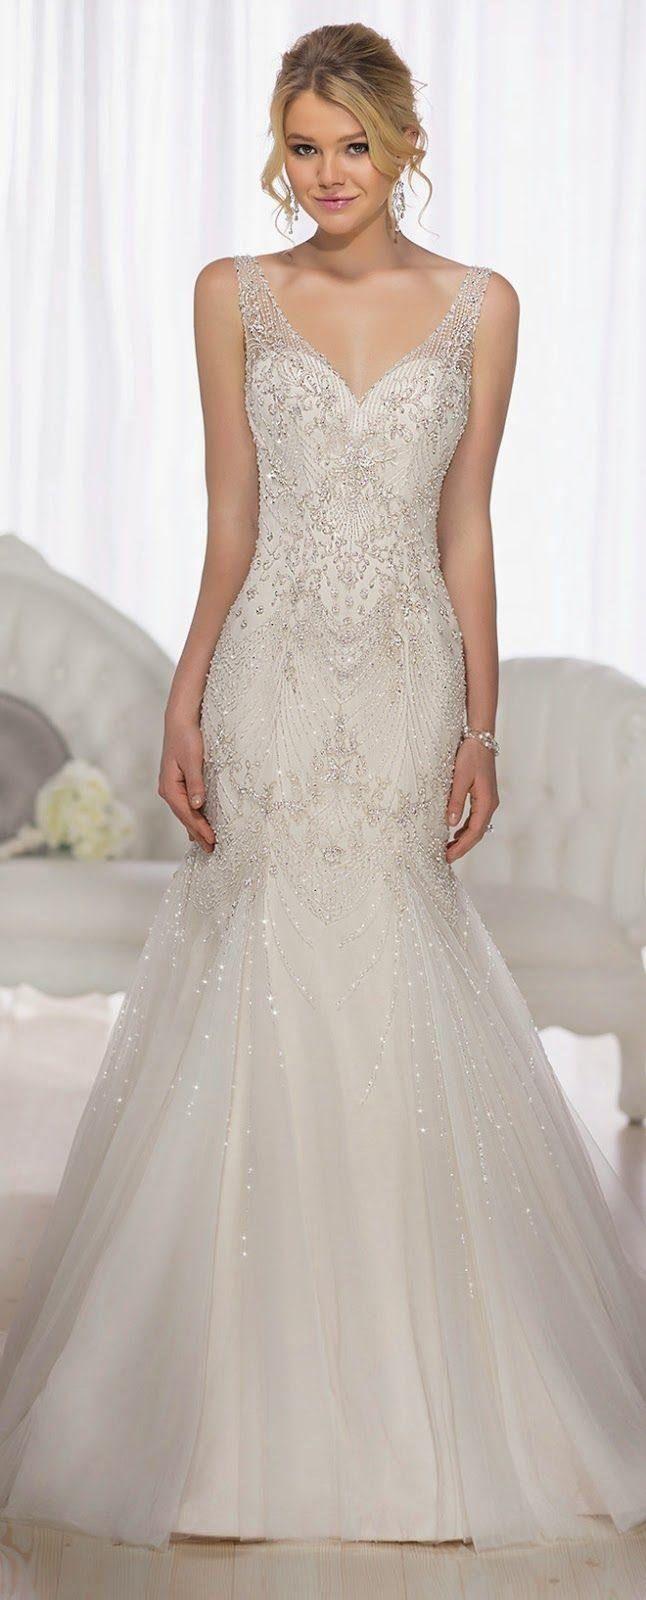 Editor S Picks 22 Amazing Hand Beaded Wedding Dresses Modwedding Wedding Dresses Beaded Essense Of Australia Wedding Dresses Stunning Wedding Dresses